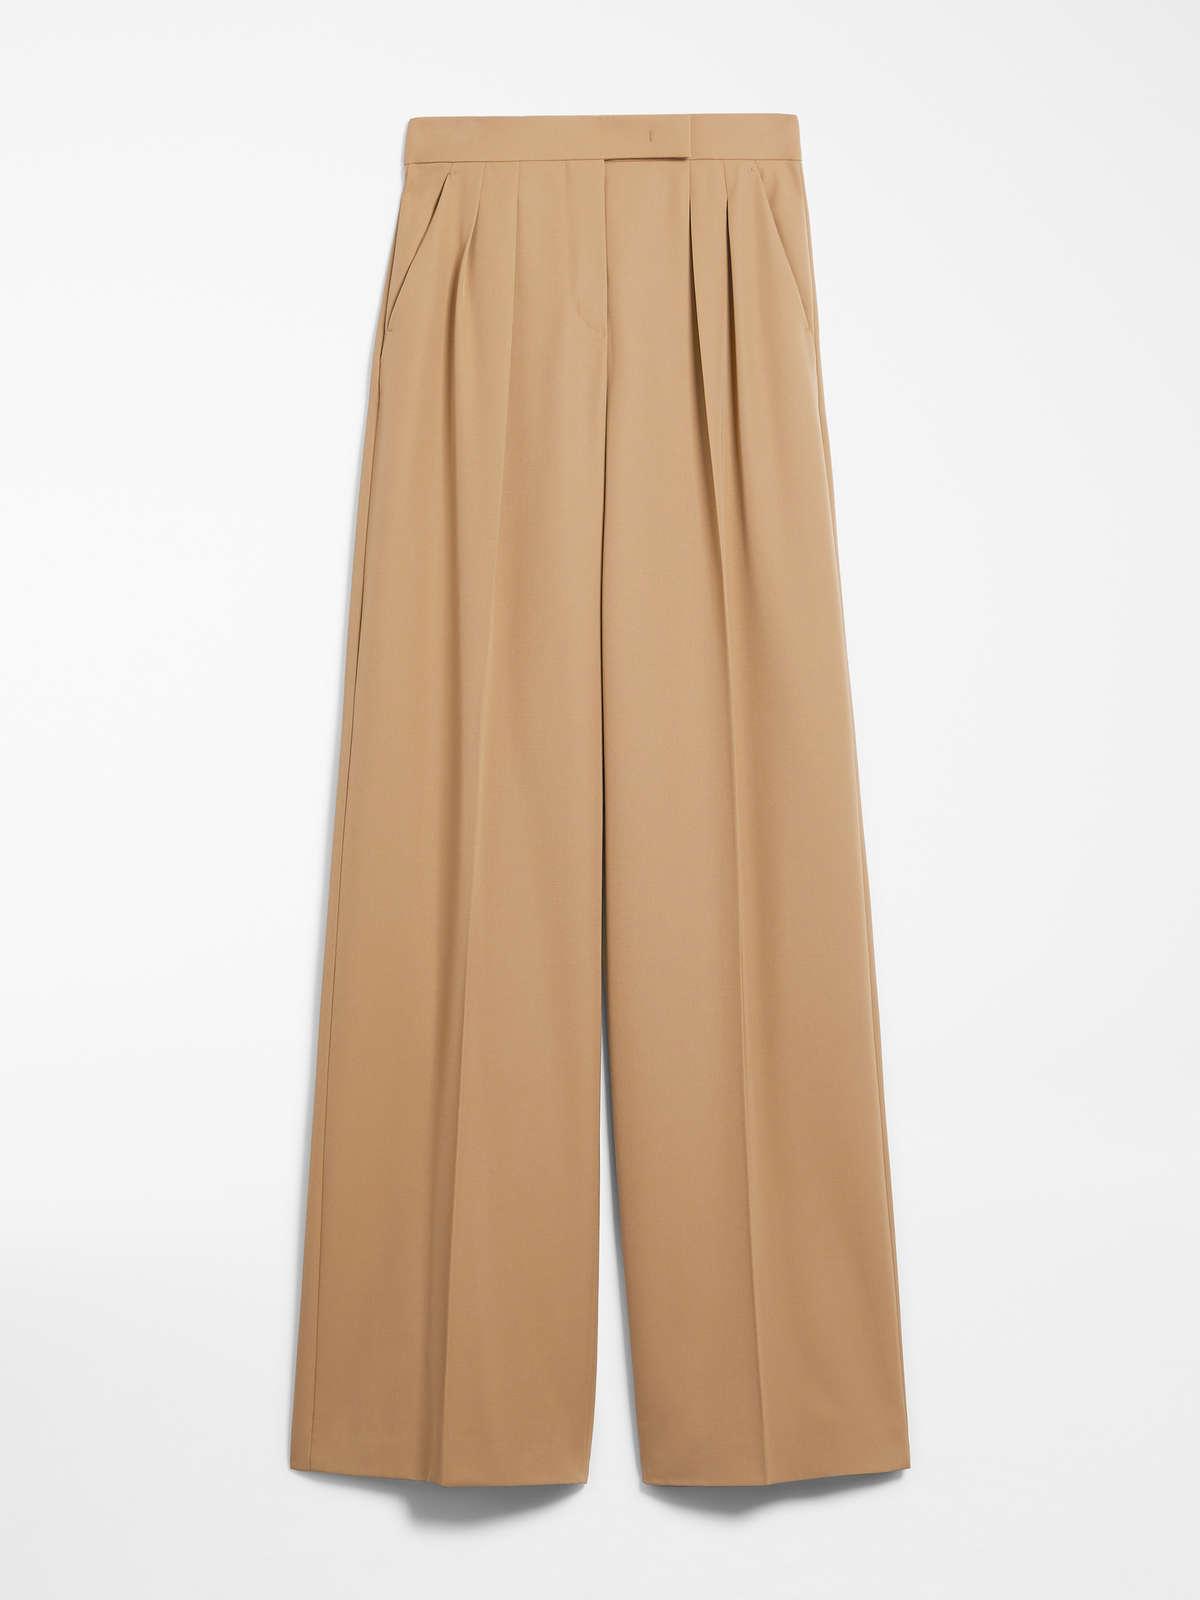 Gabardine Wool Trousers by Max Mara